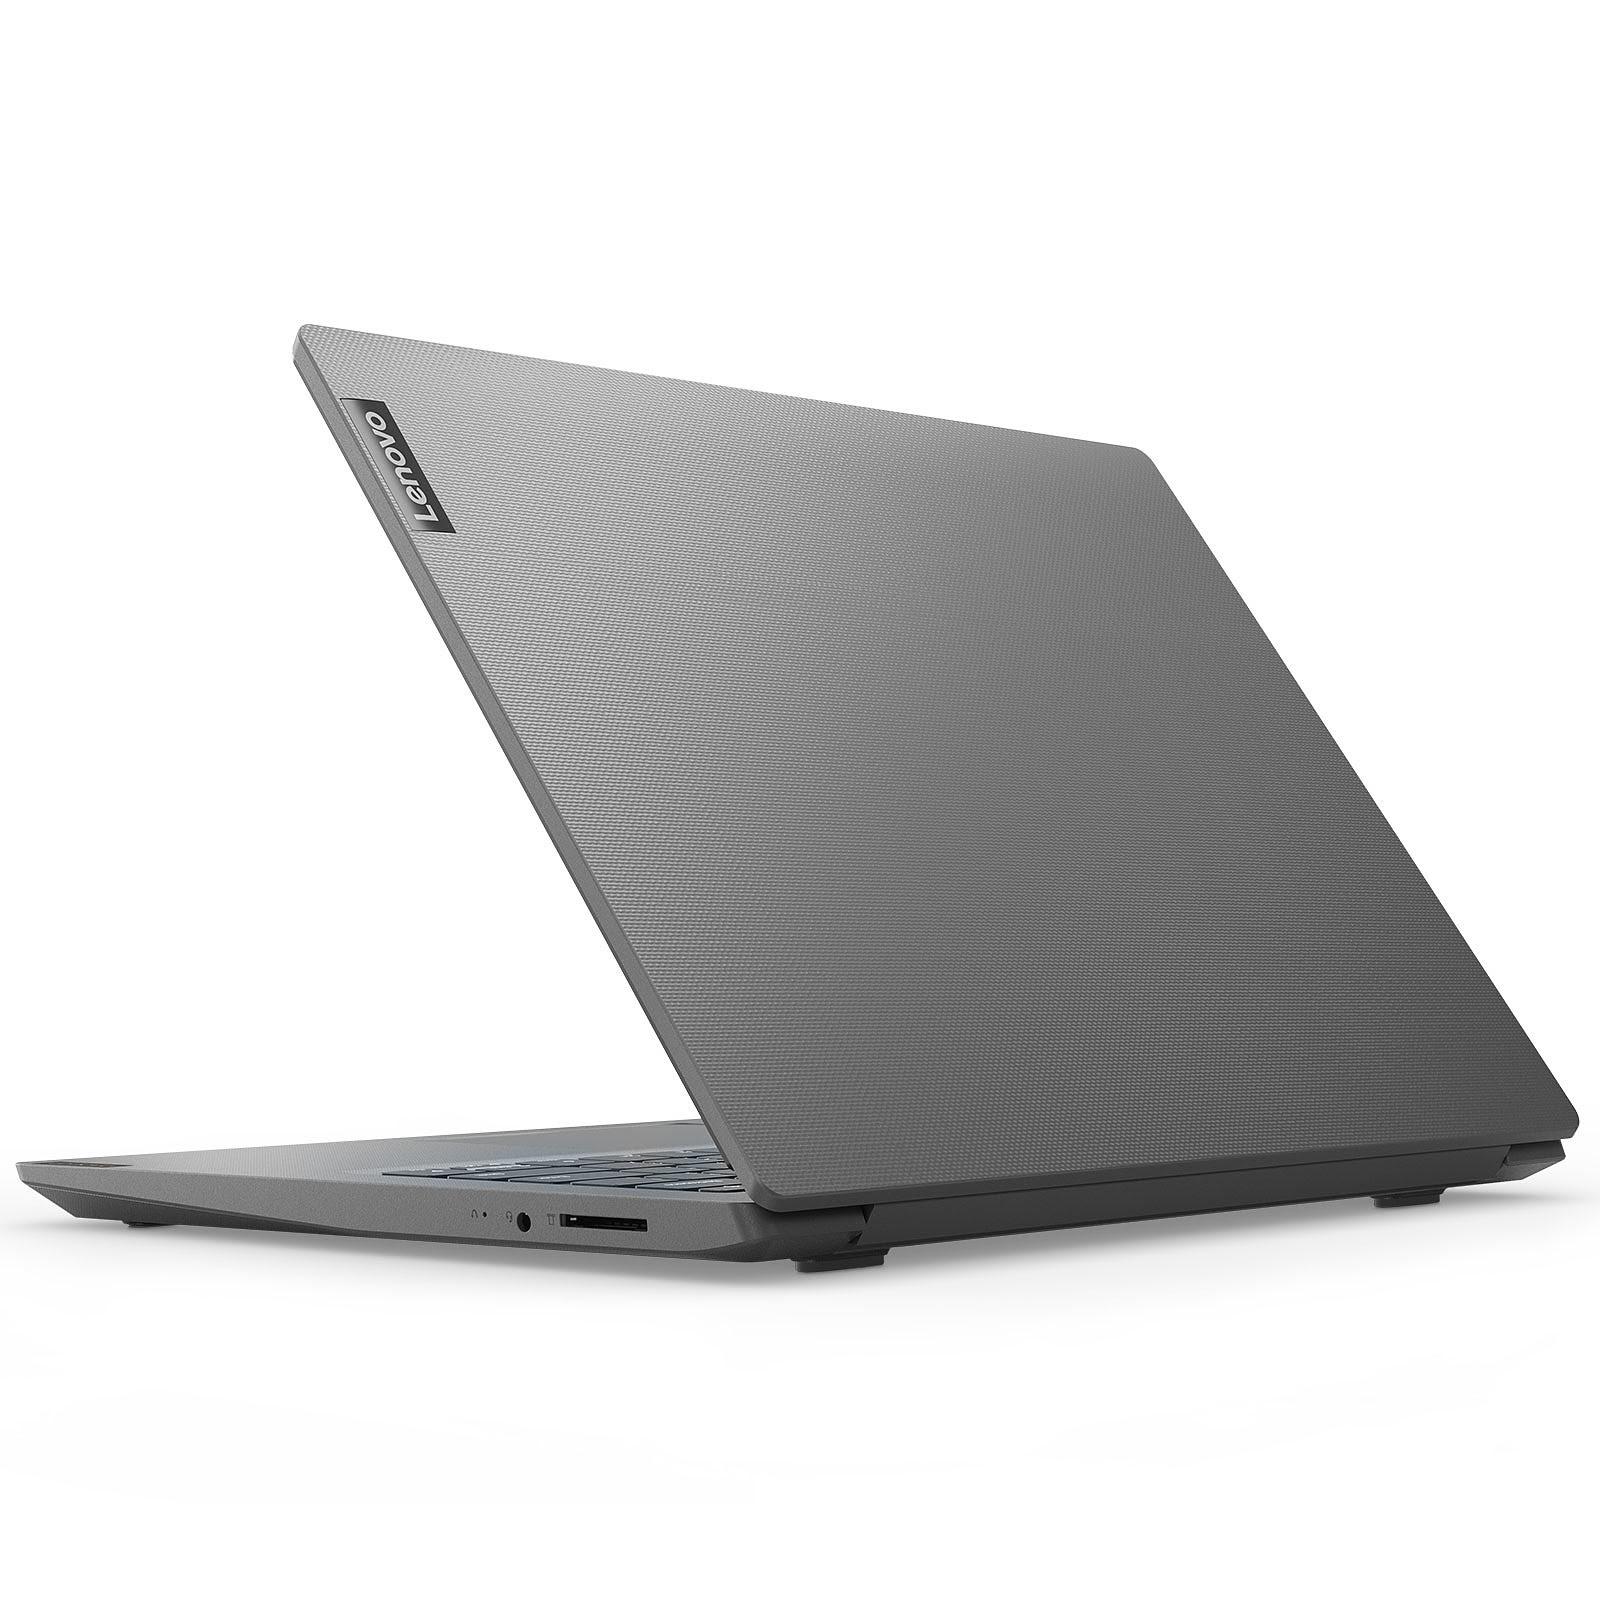 Lenovo 82C400SFFR - PC portable Lenovo - Cybertek.fr - 1